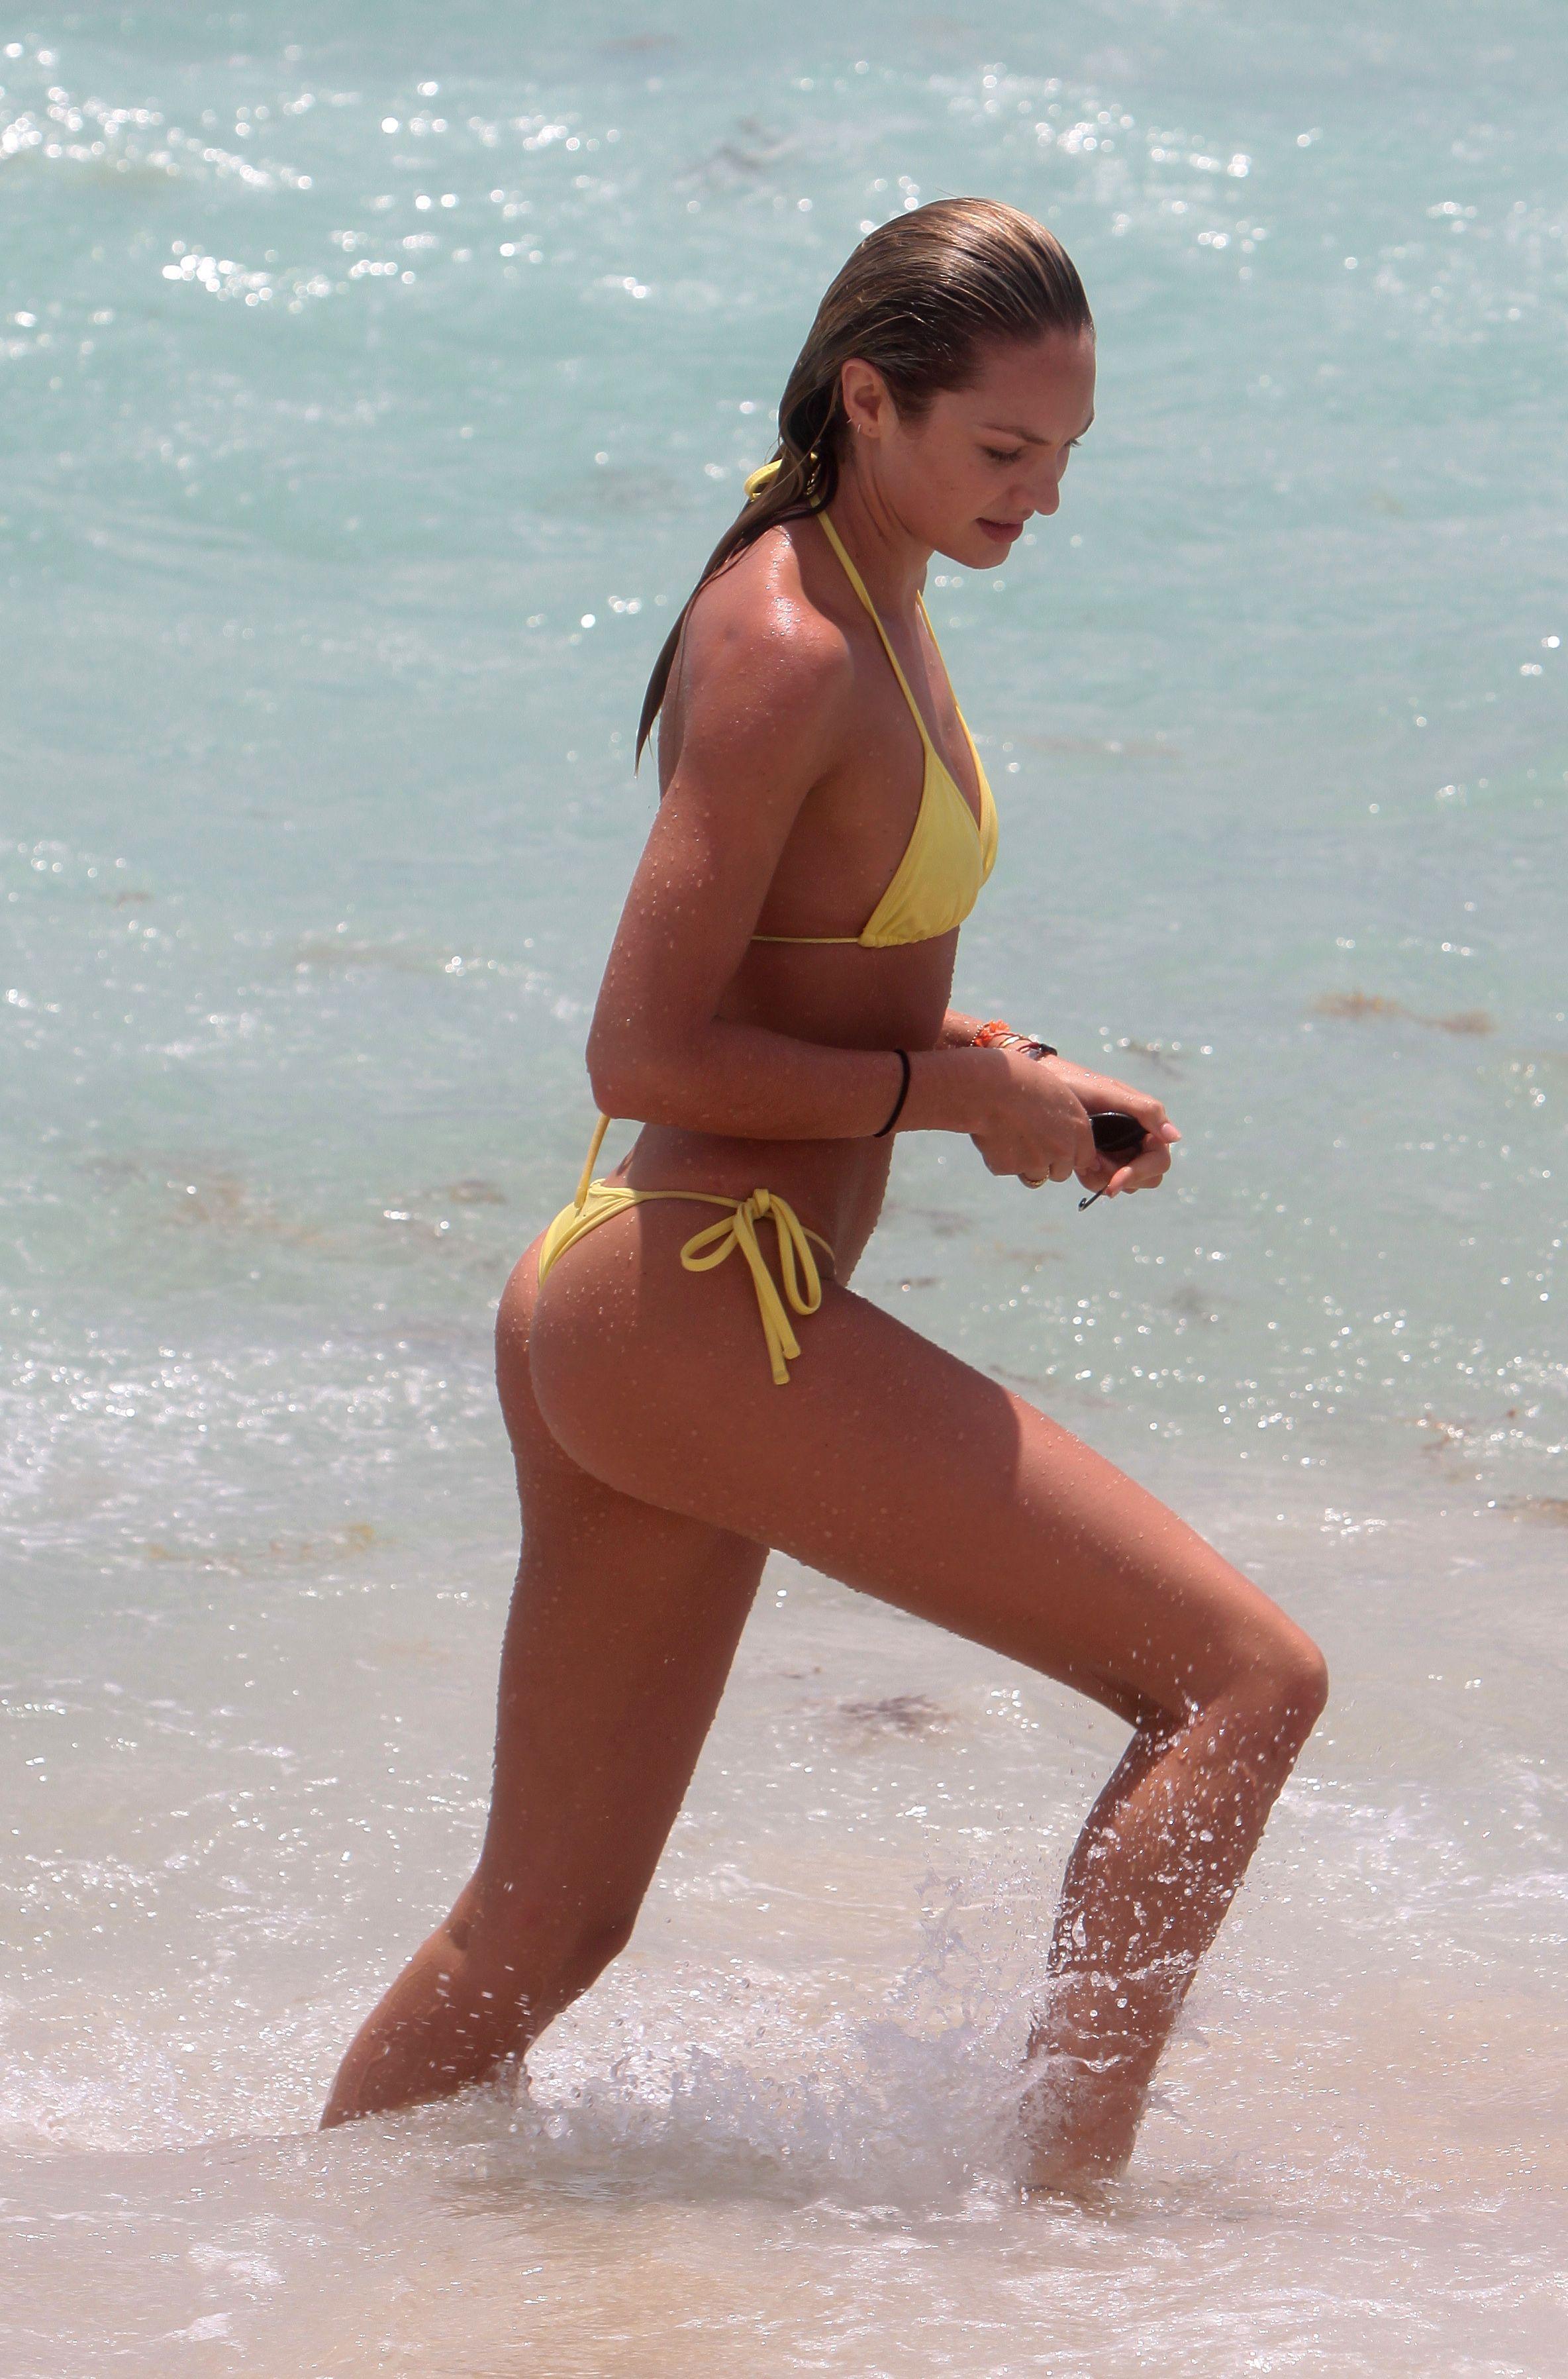 Candice Swanepoel leaked nude